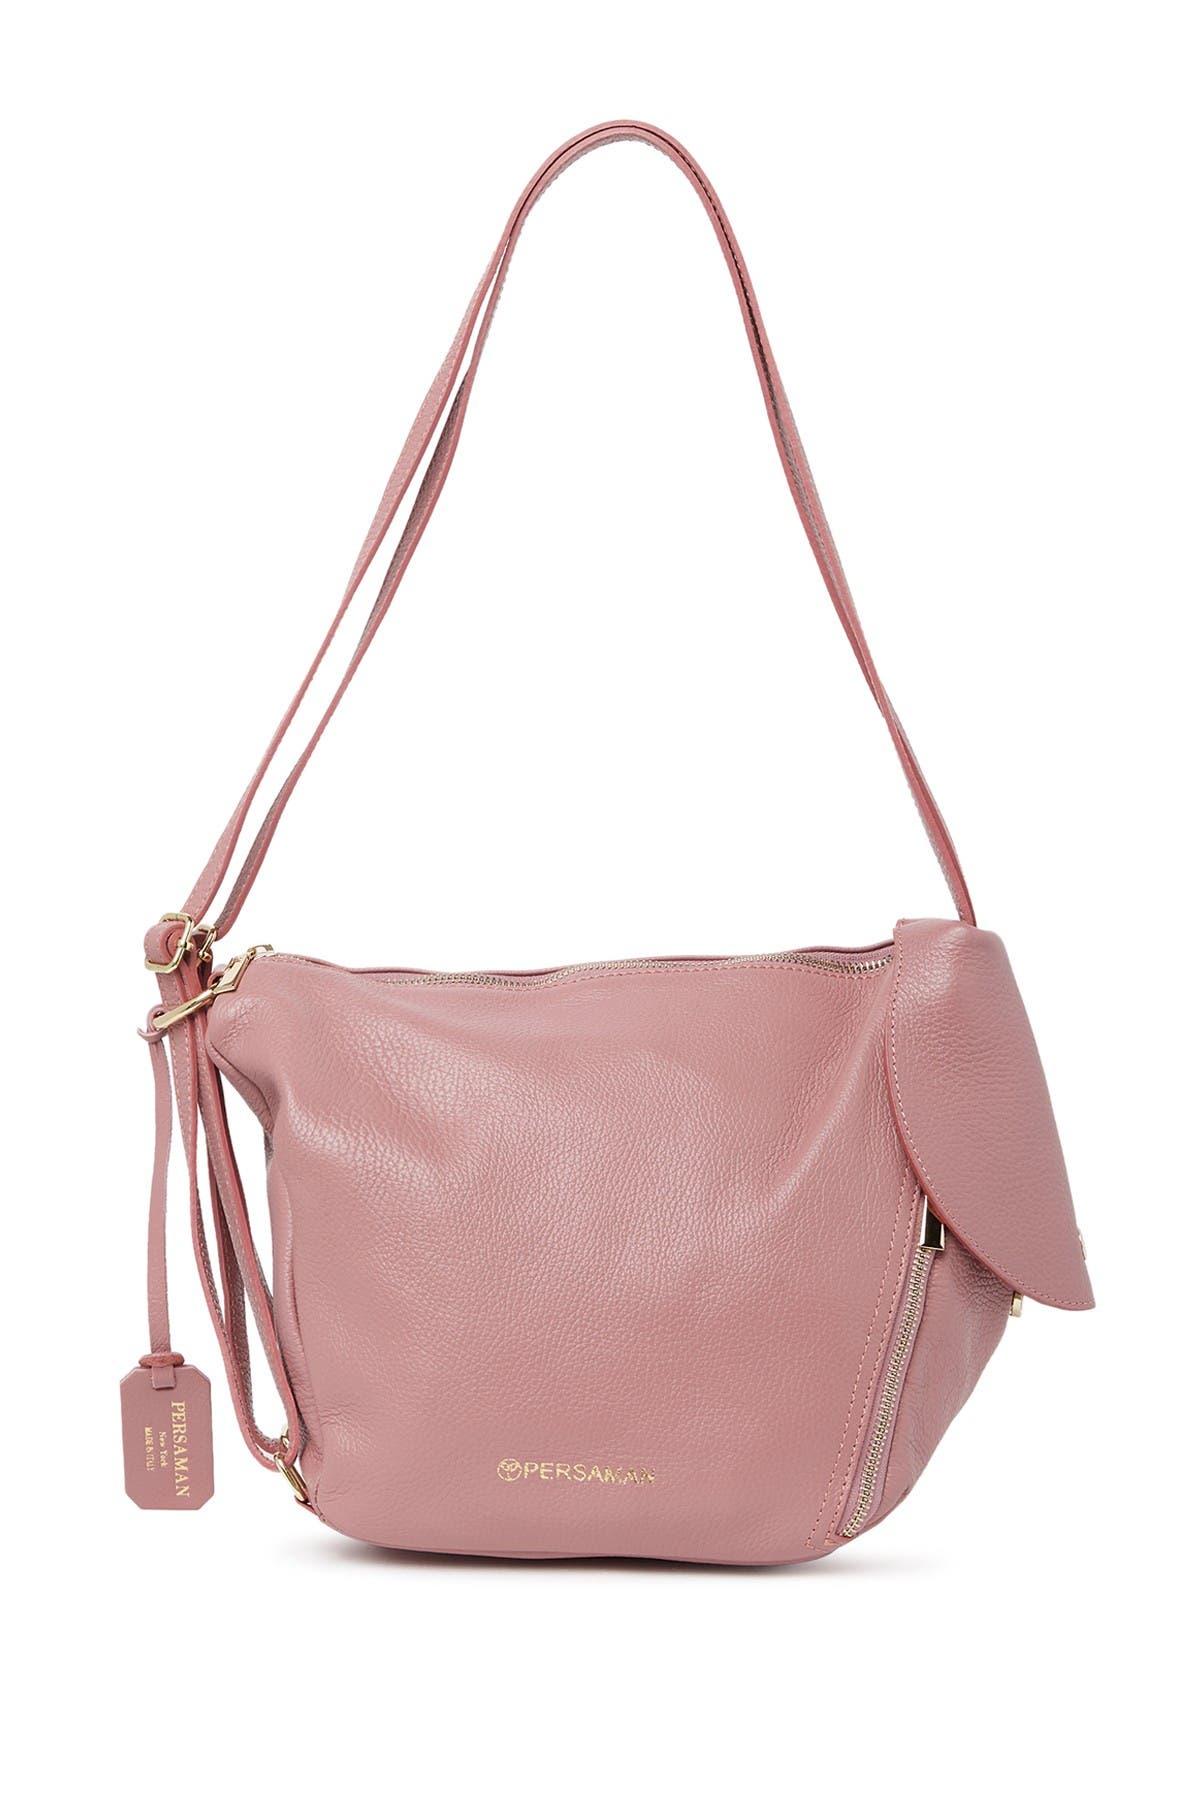 Persaman New York Louise Shoulder Bag at Nordstrom Rack